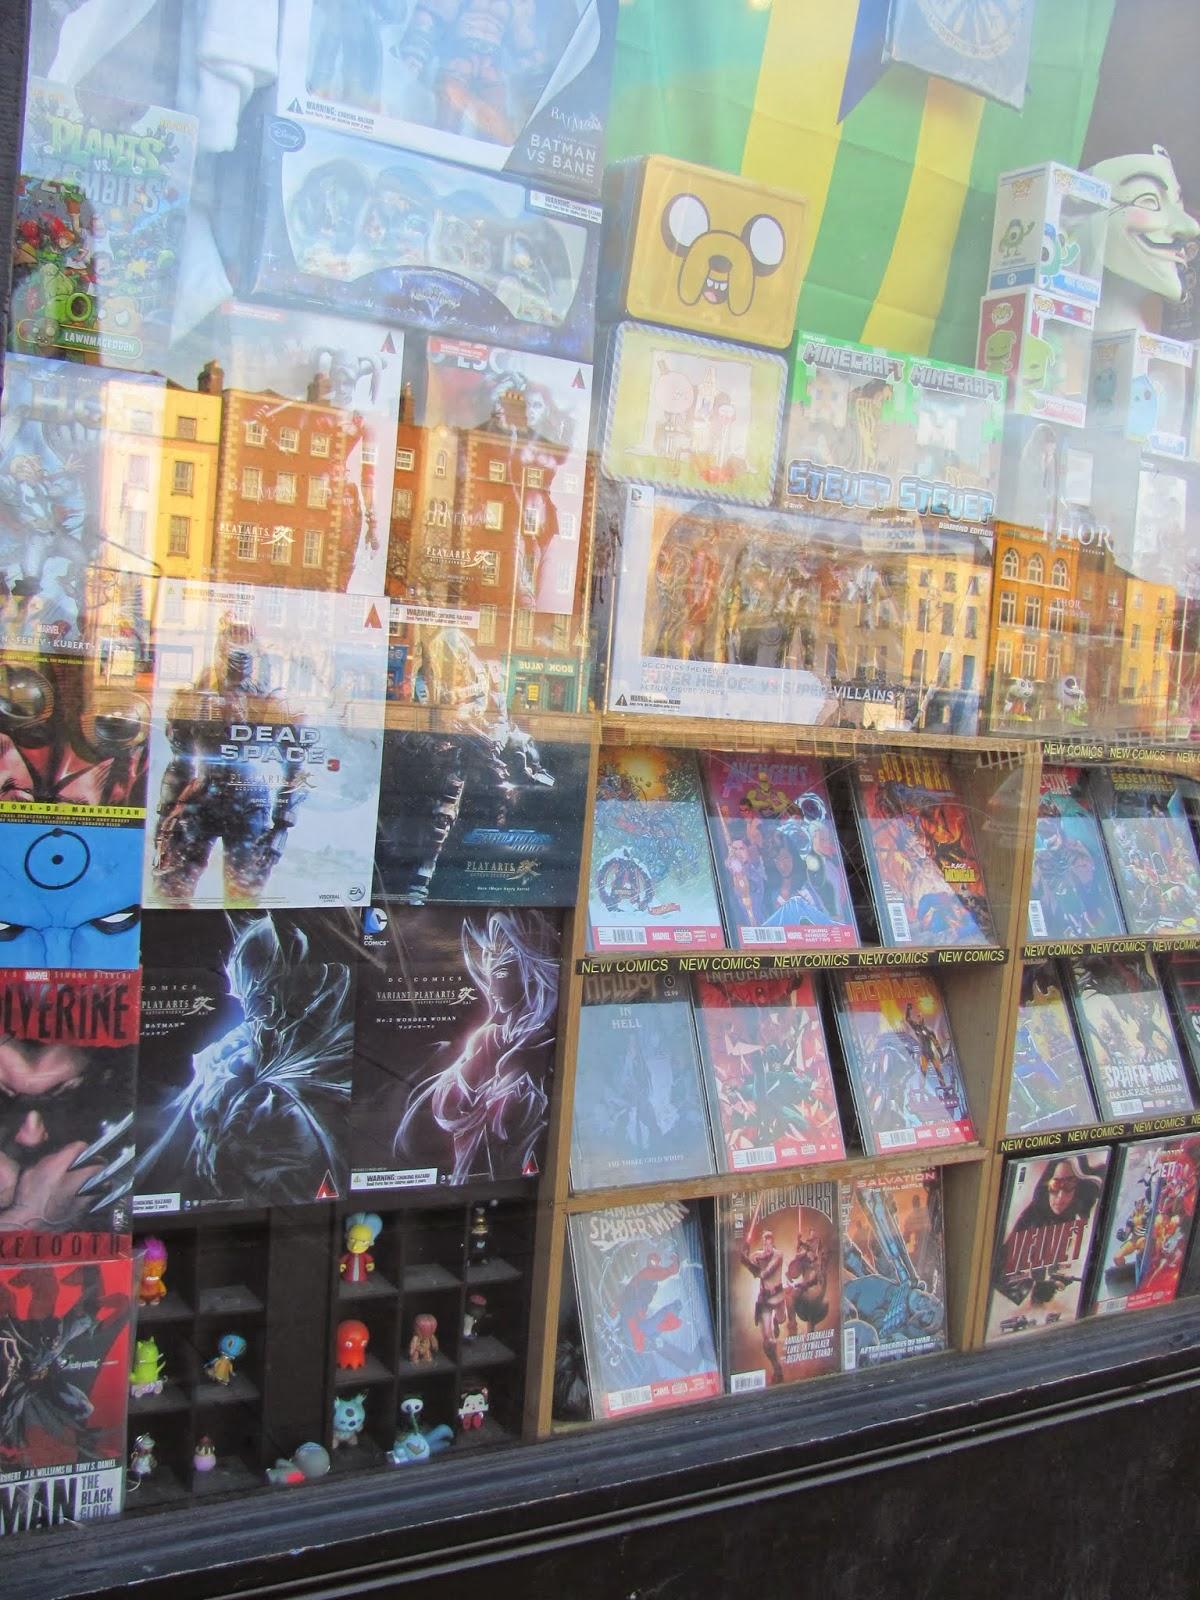 Forbidden Planet Comic Shop display window